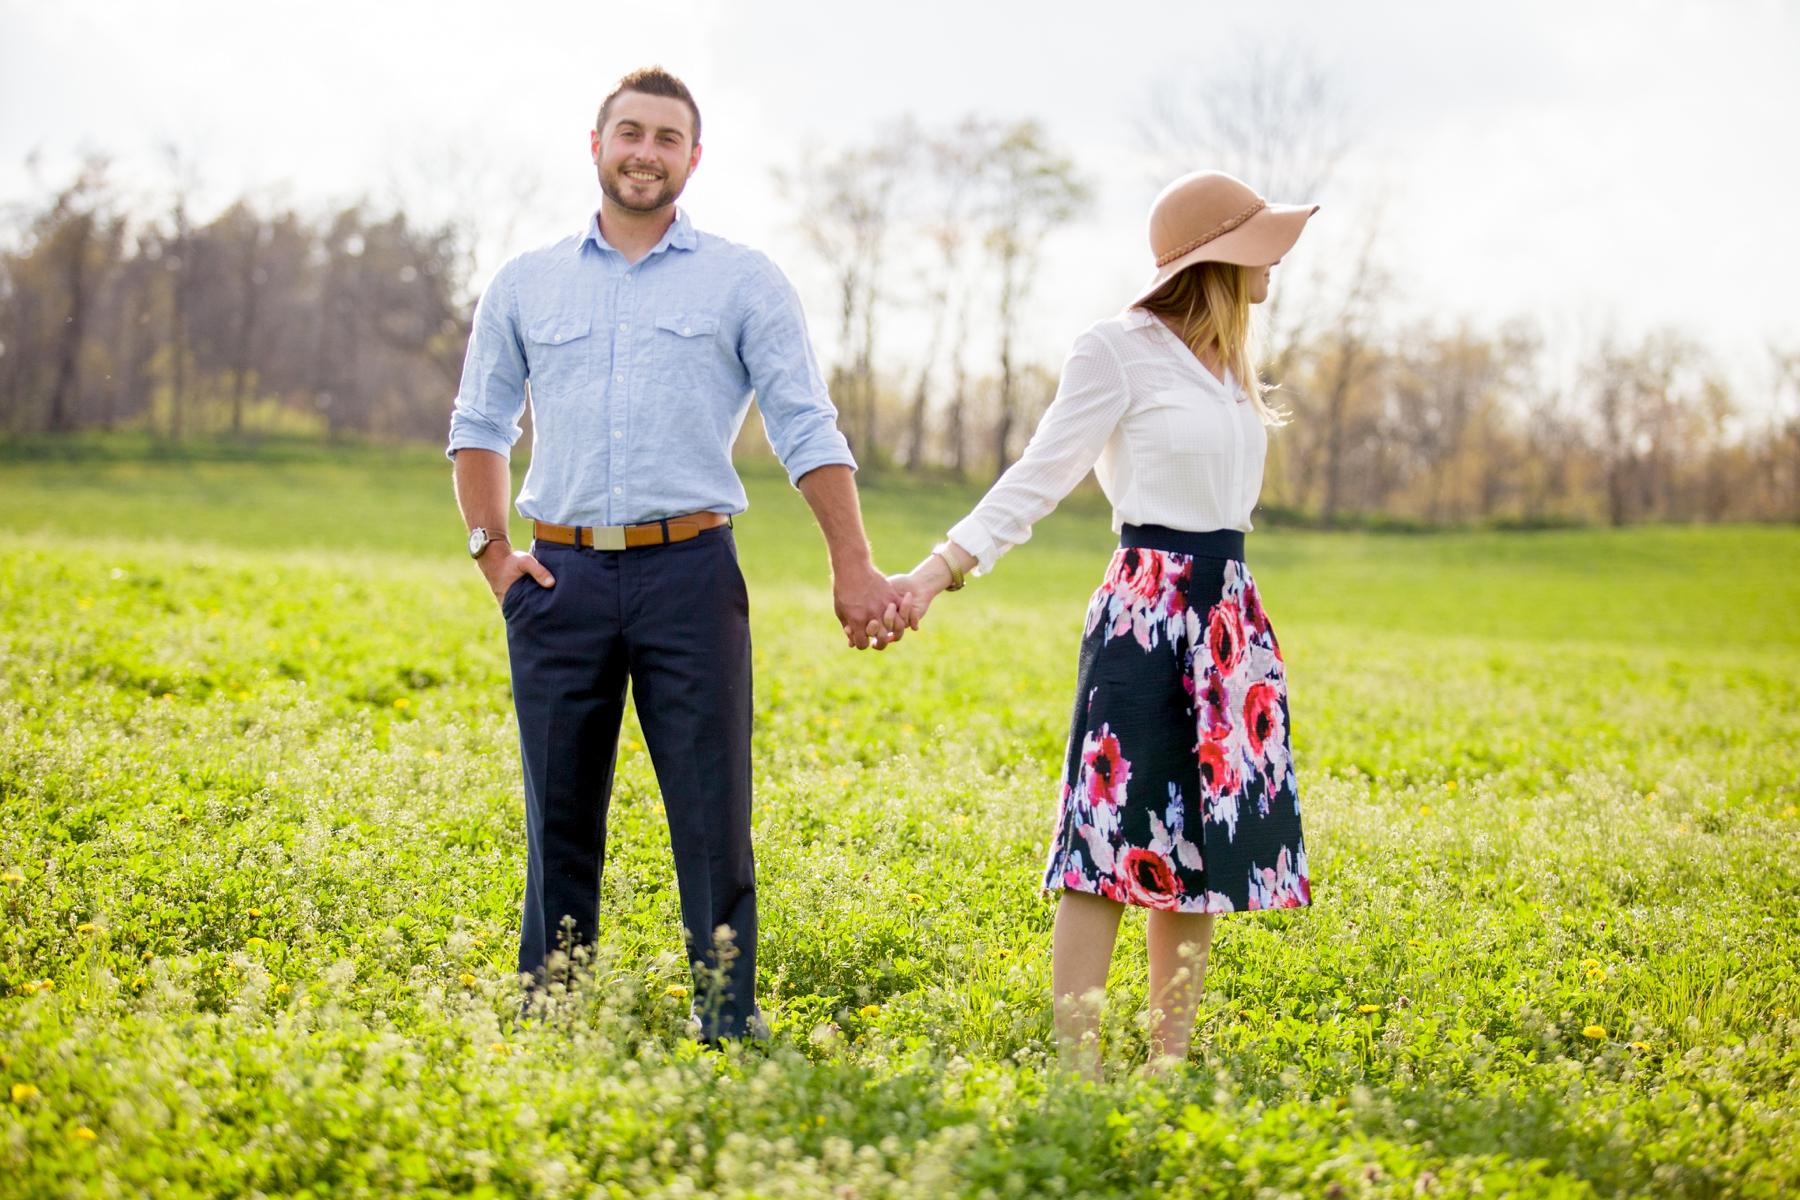 Brandon_Shafer_Photography_Shane_Ashley_Greenhouse_Farm_Michigan_Engagement_0014.jpg